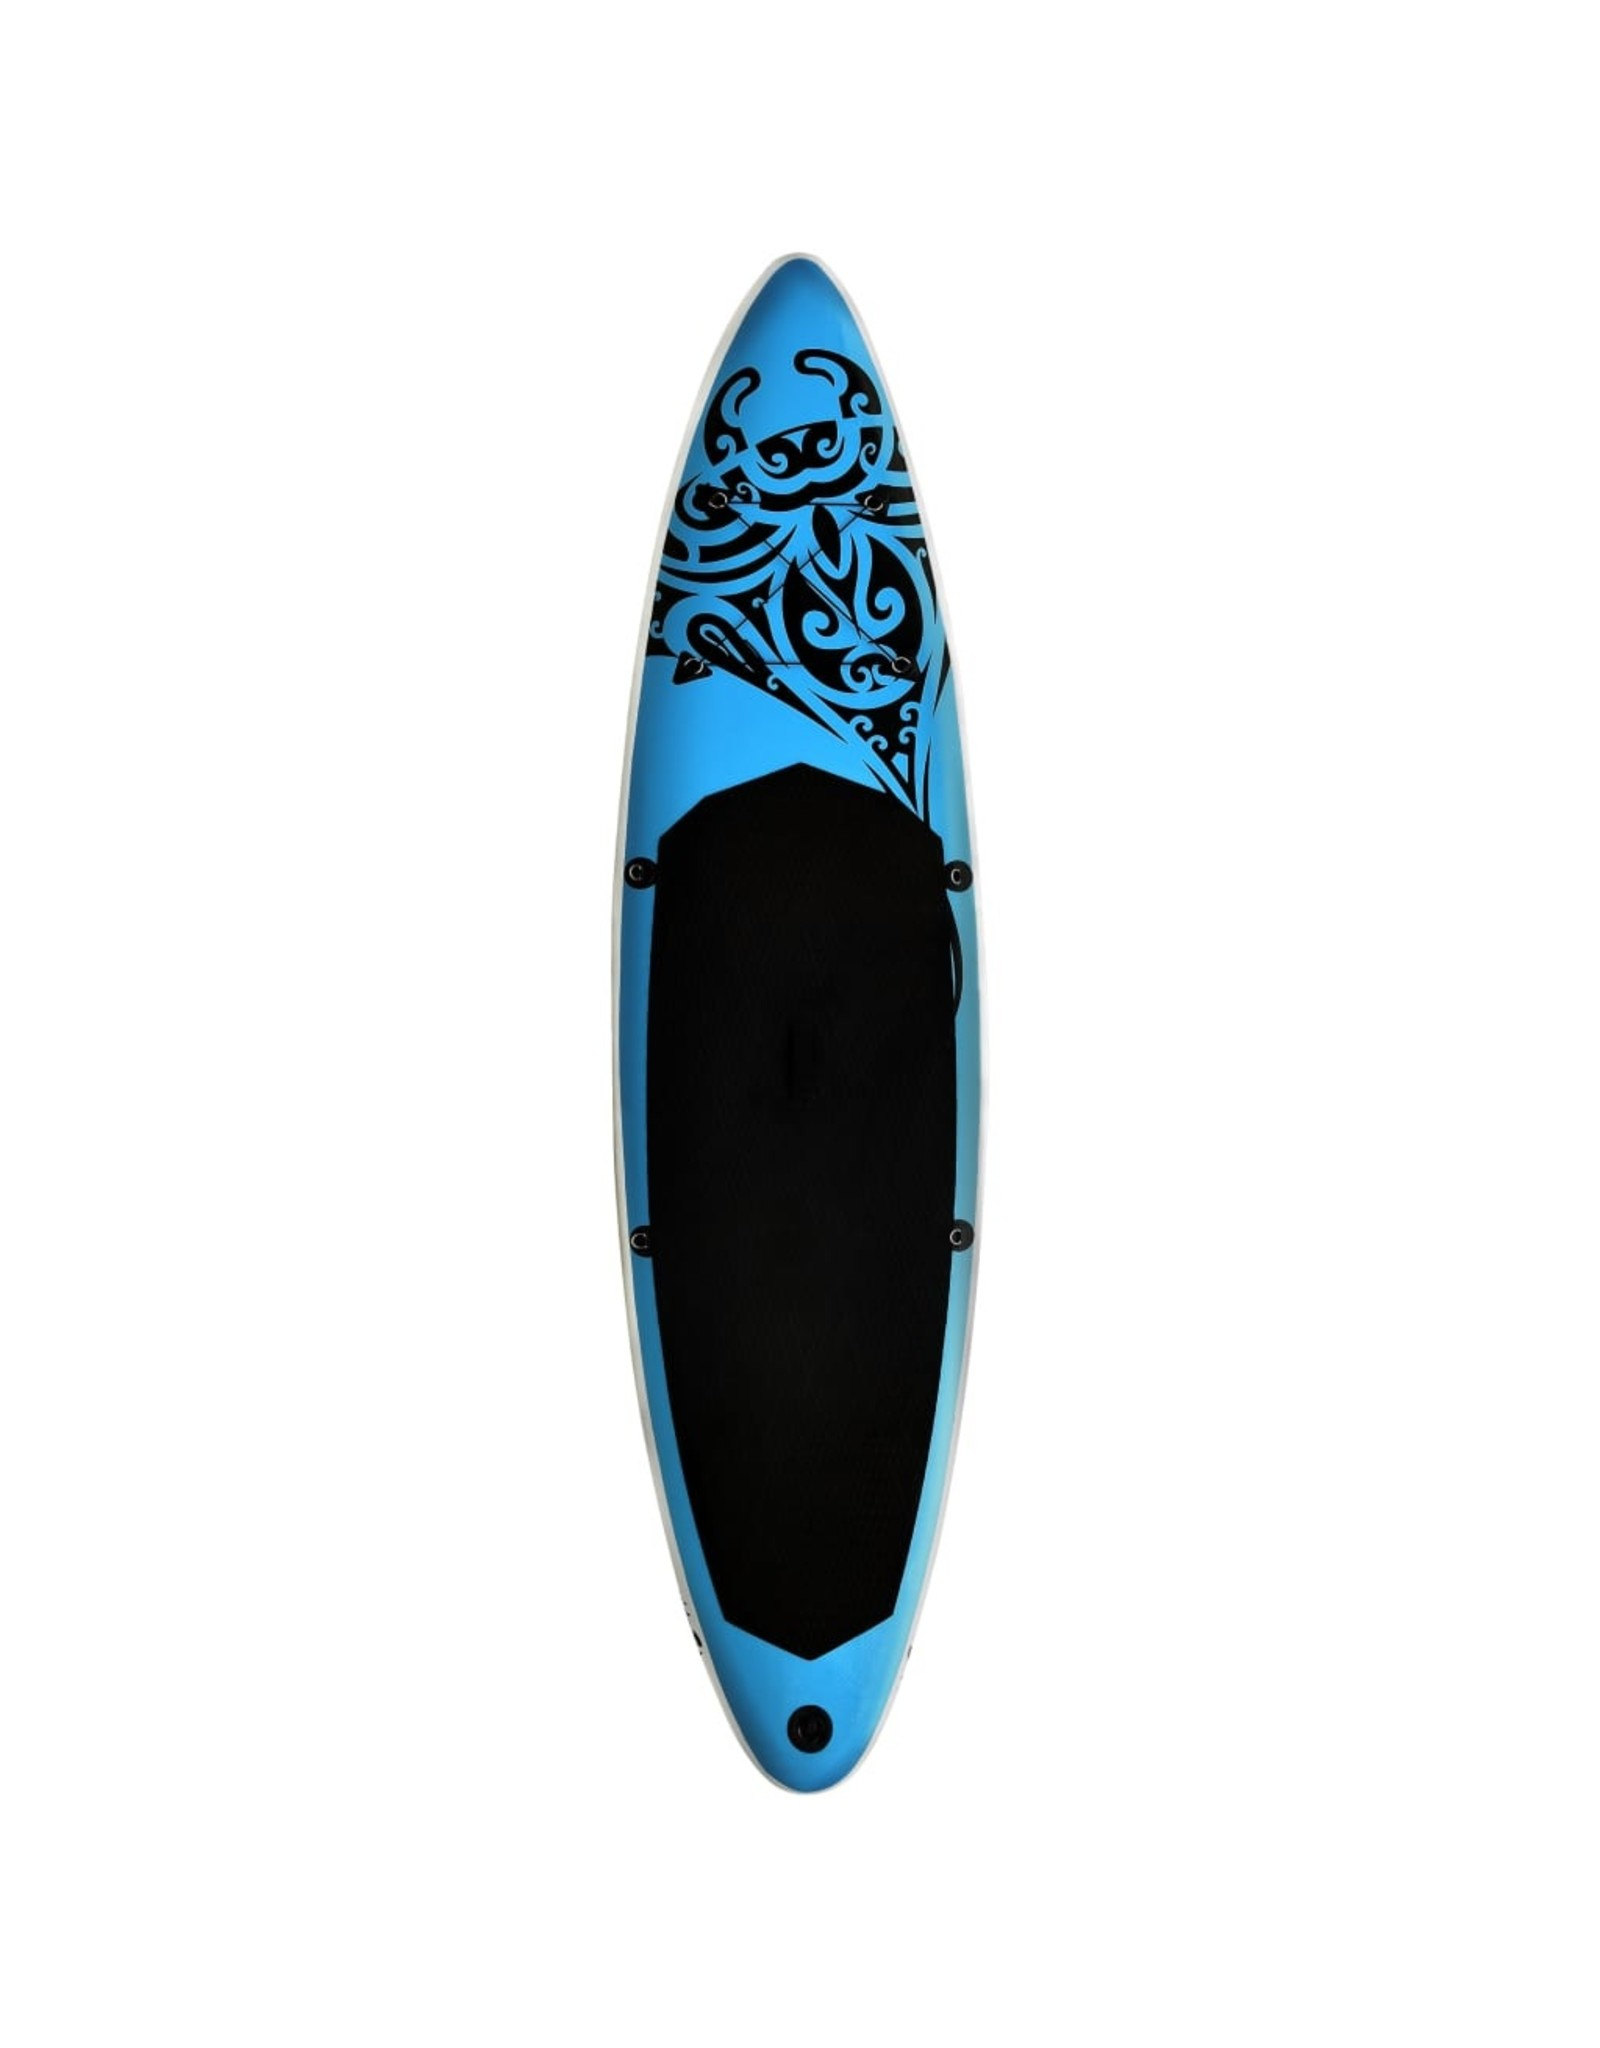 Stand Up Paddleboardset opblaasbaar 305x76x15 cm blauw